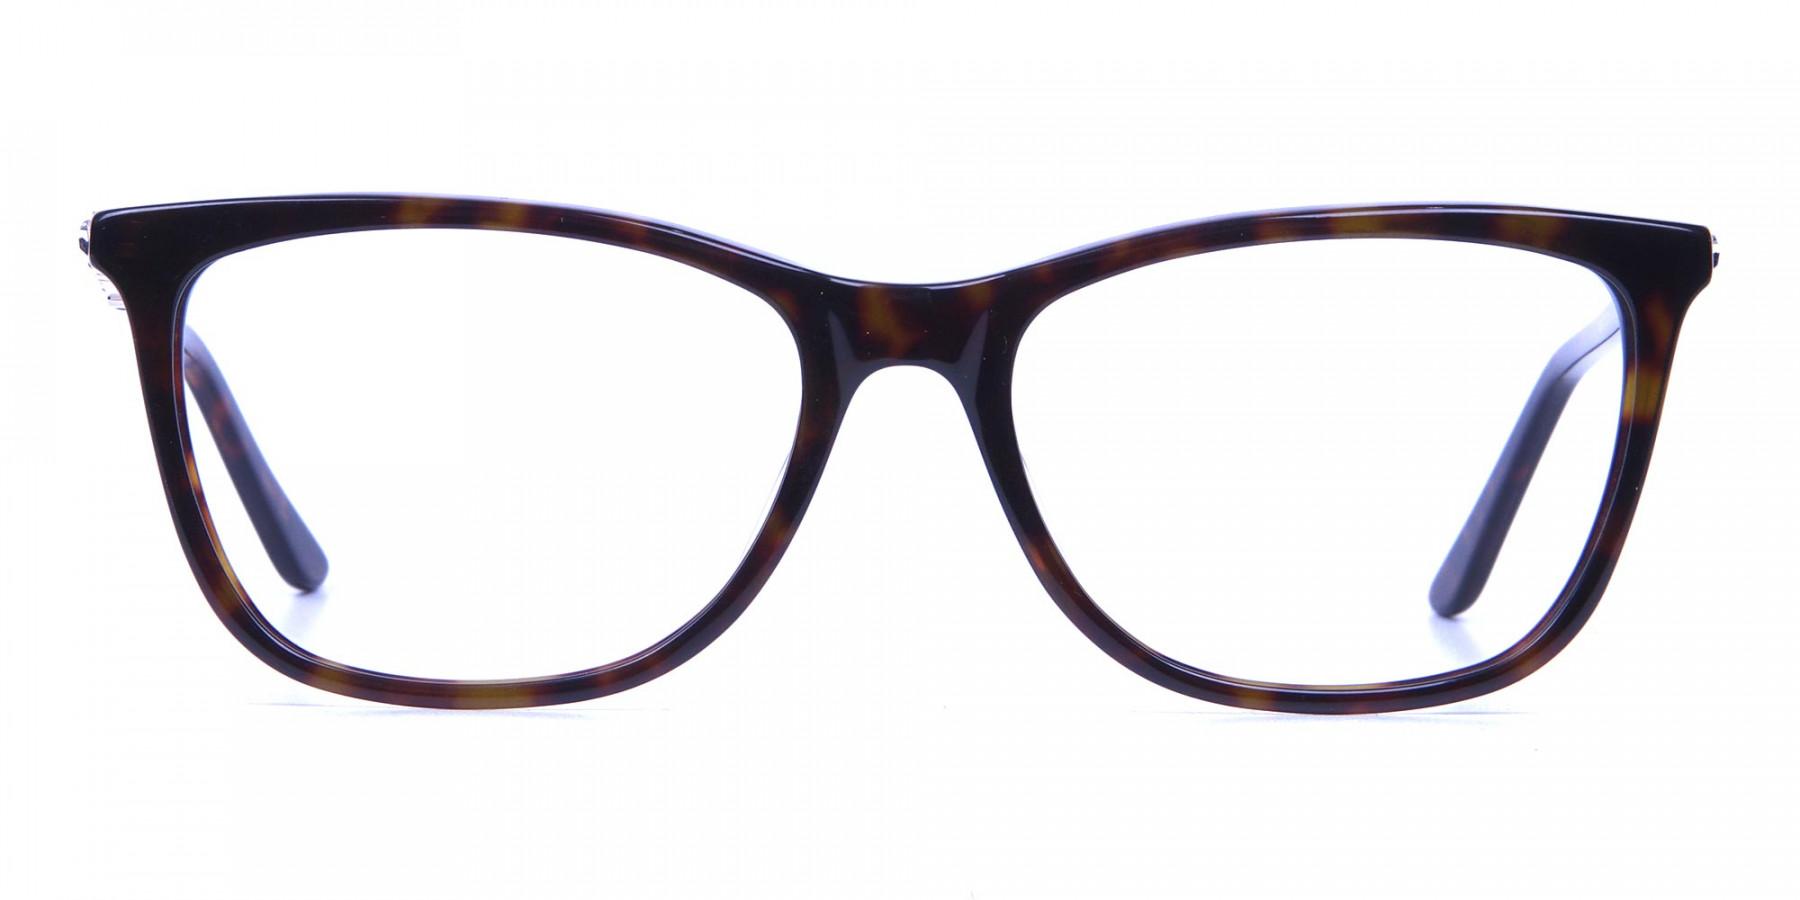 Tortoiseshell Glasses of Personality Look